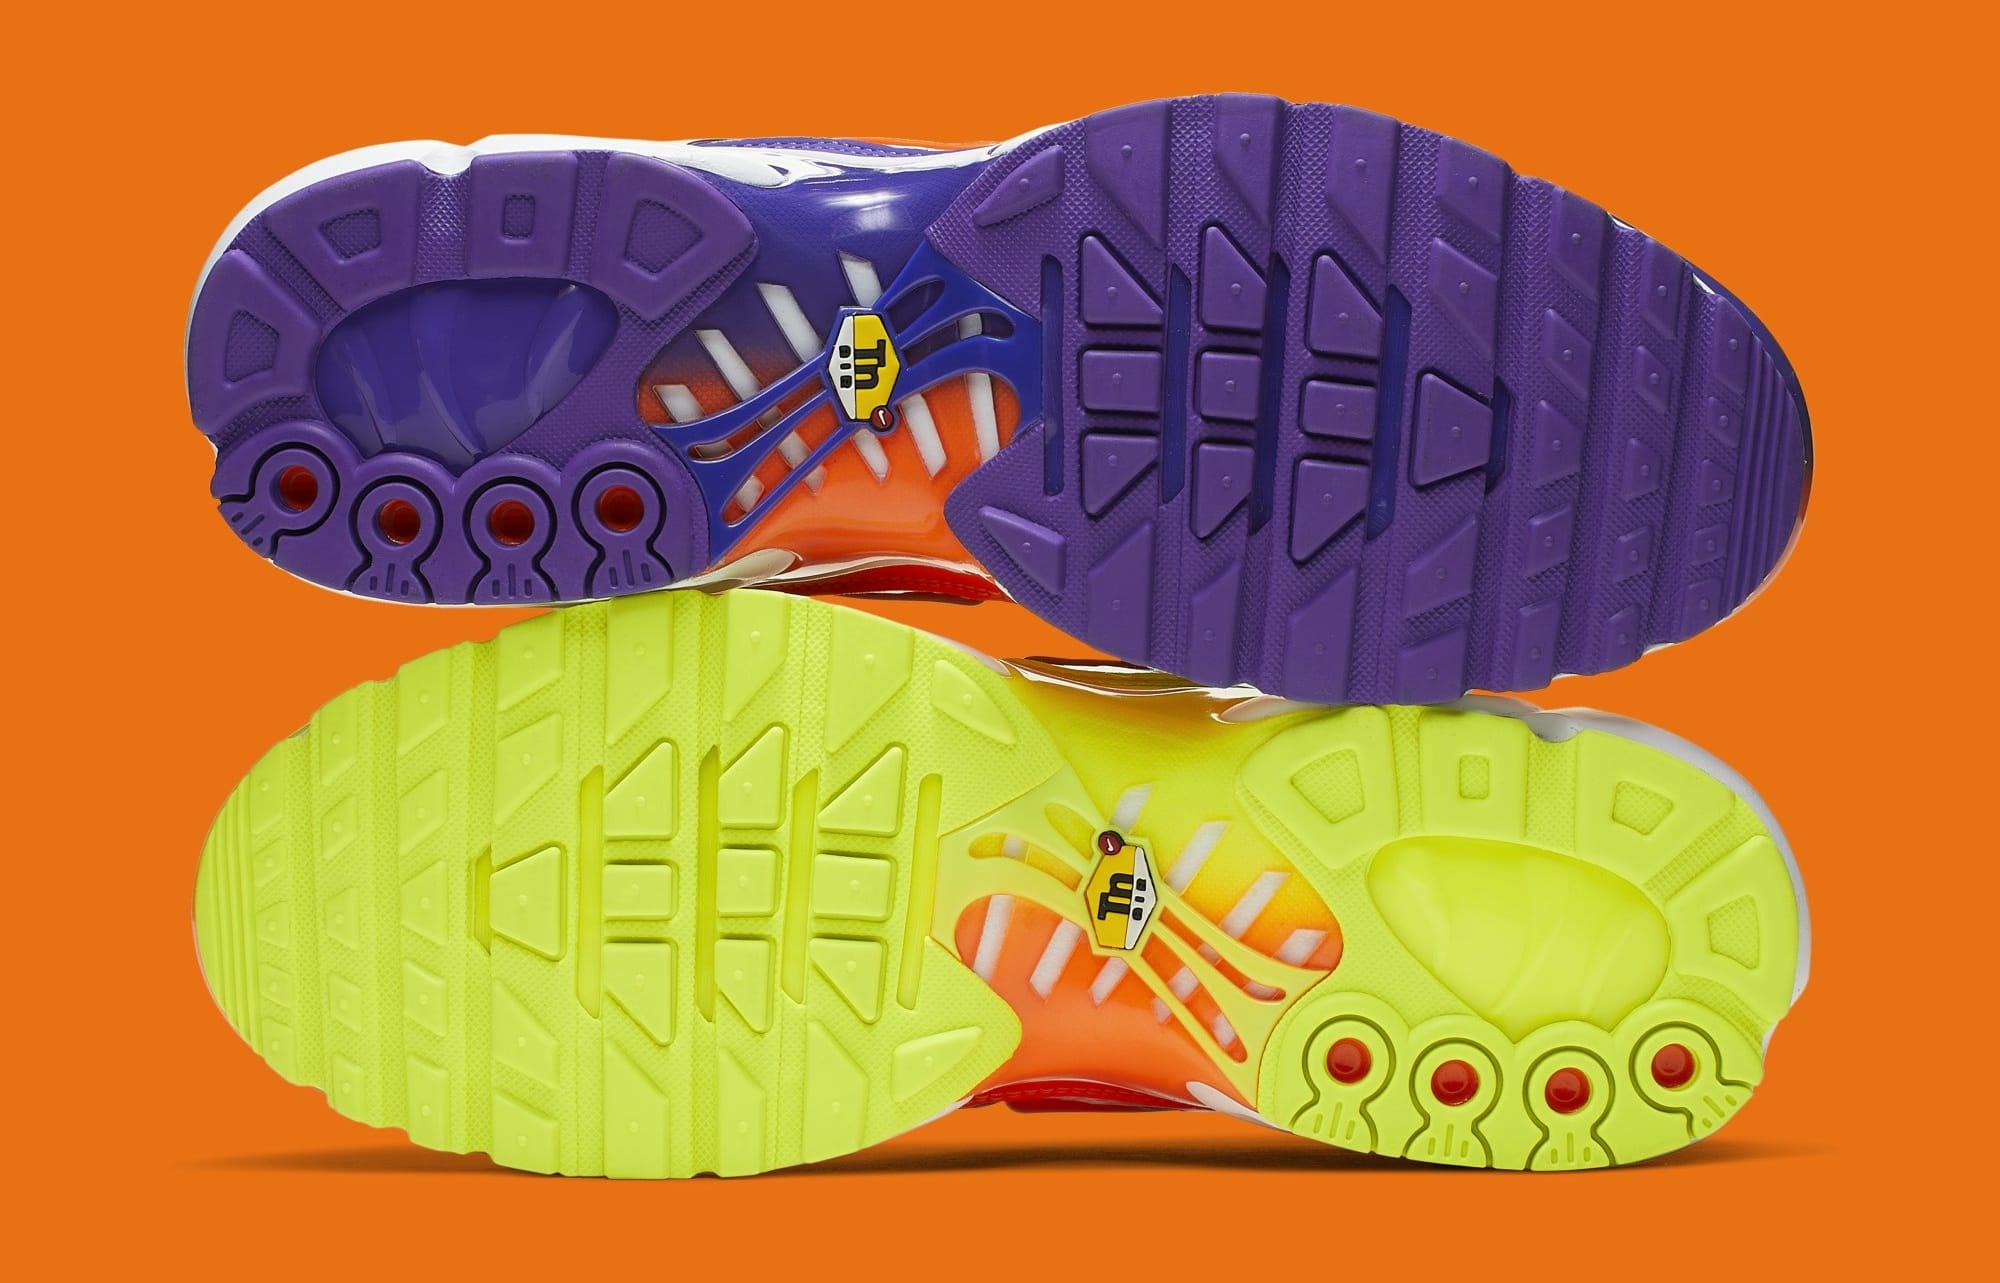 Nike Air Max Plus 'Color Flip/Black' CI5924-061 (Bottom)